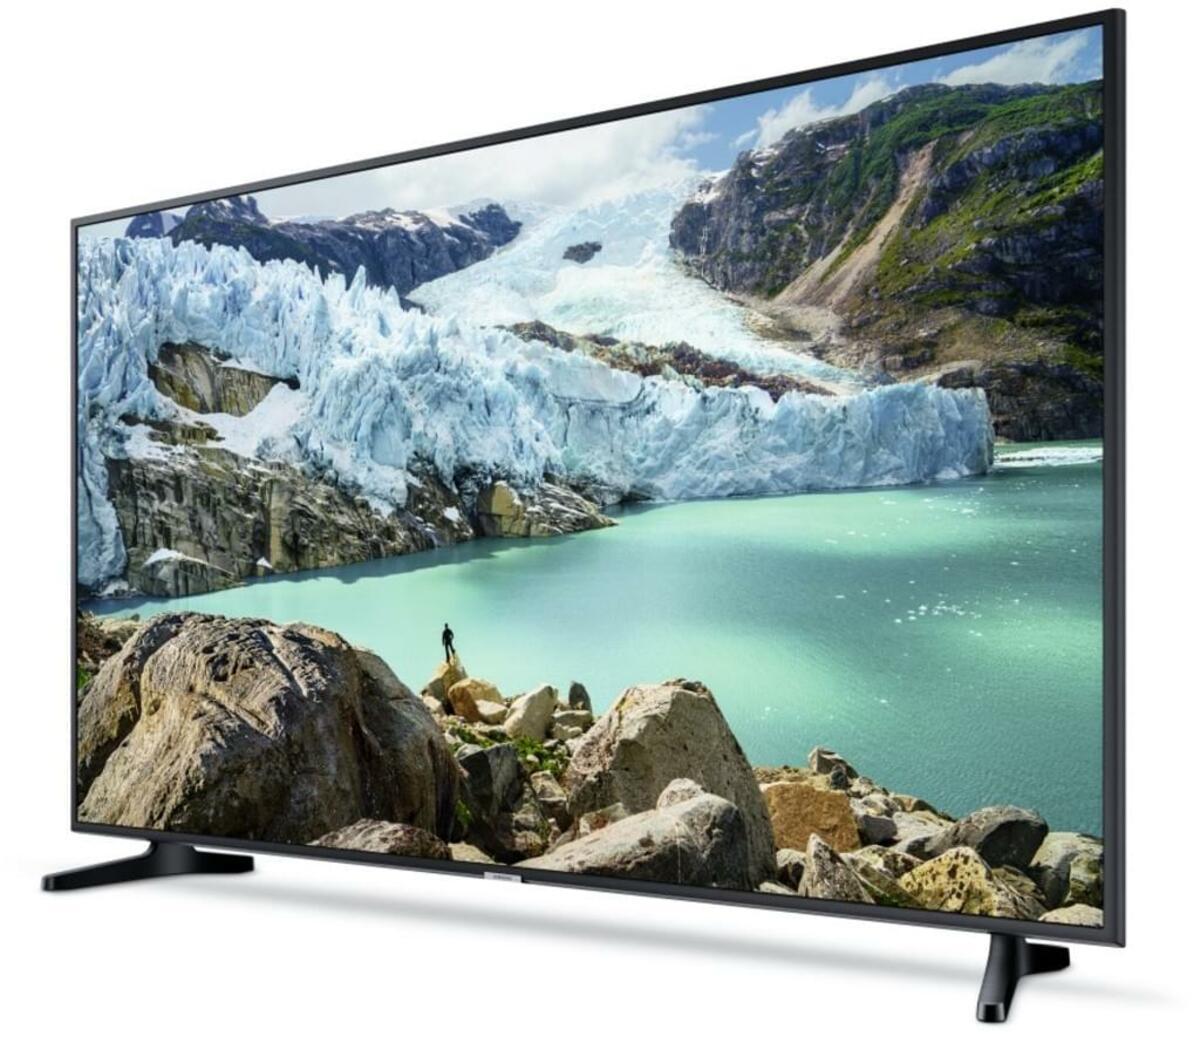 Bild 2 von Samsung 4K Ultra HD LED 125 cm (50 Zoll) UE50RU7099 UHD Smart TV, Triple Tuner, HDR10+